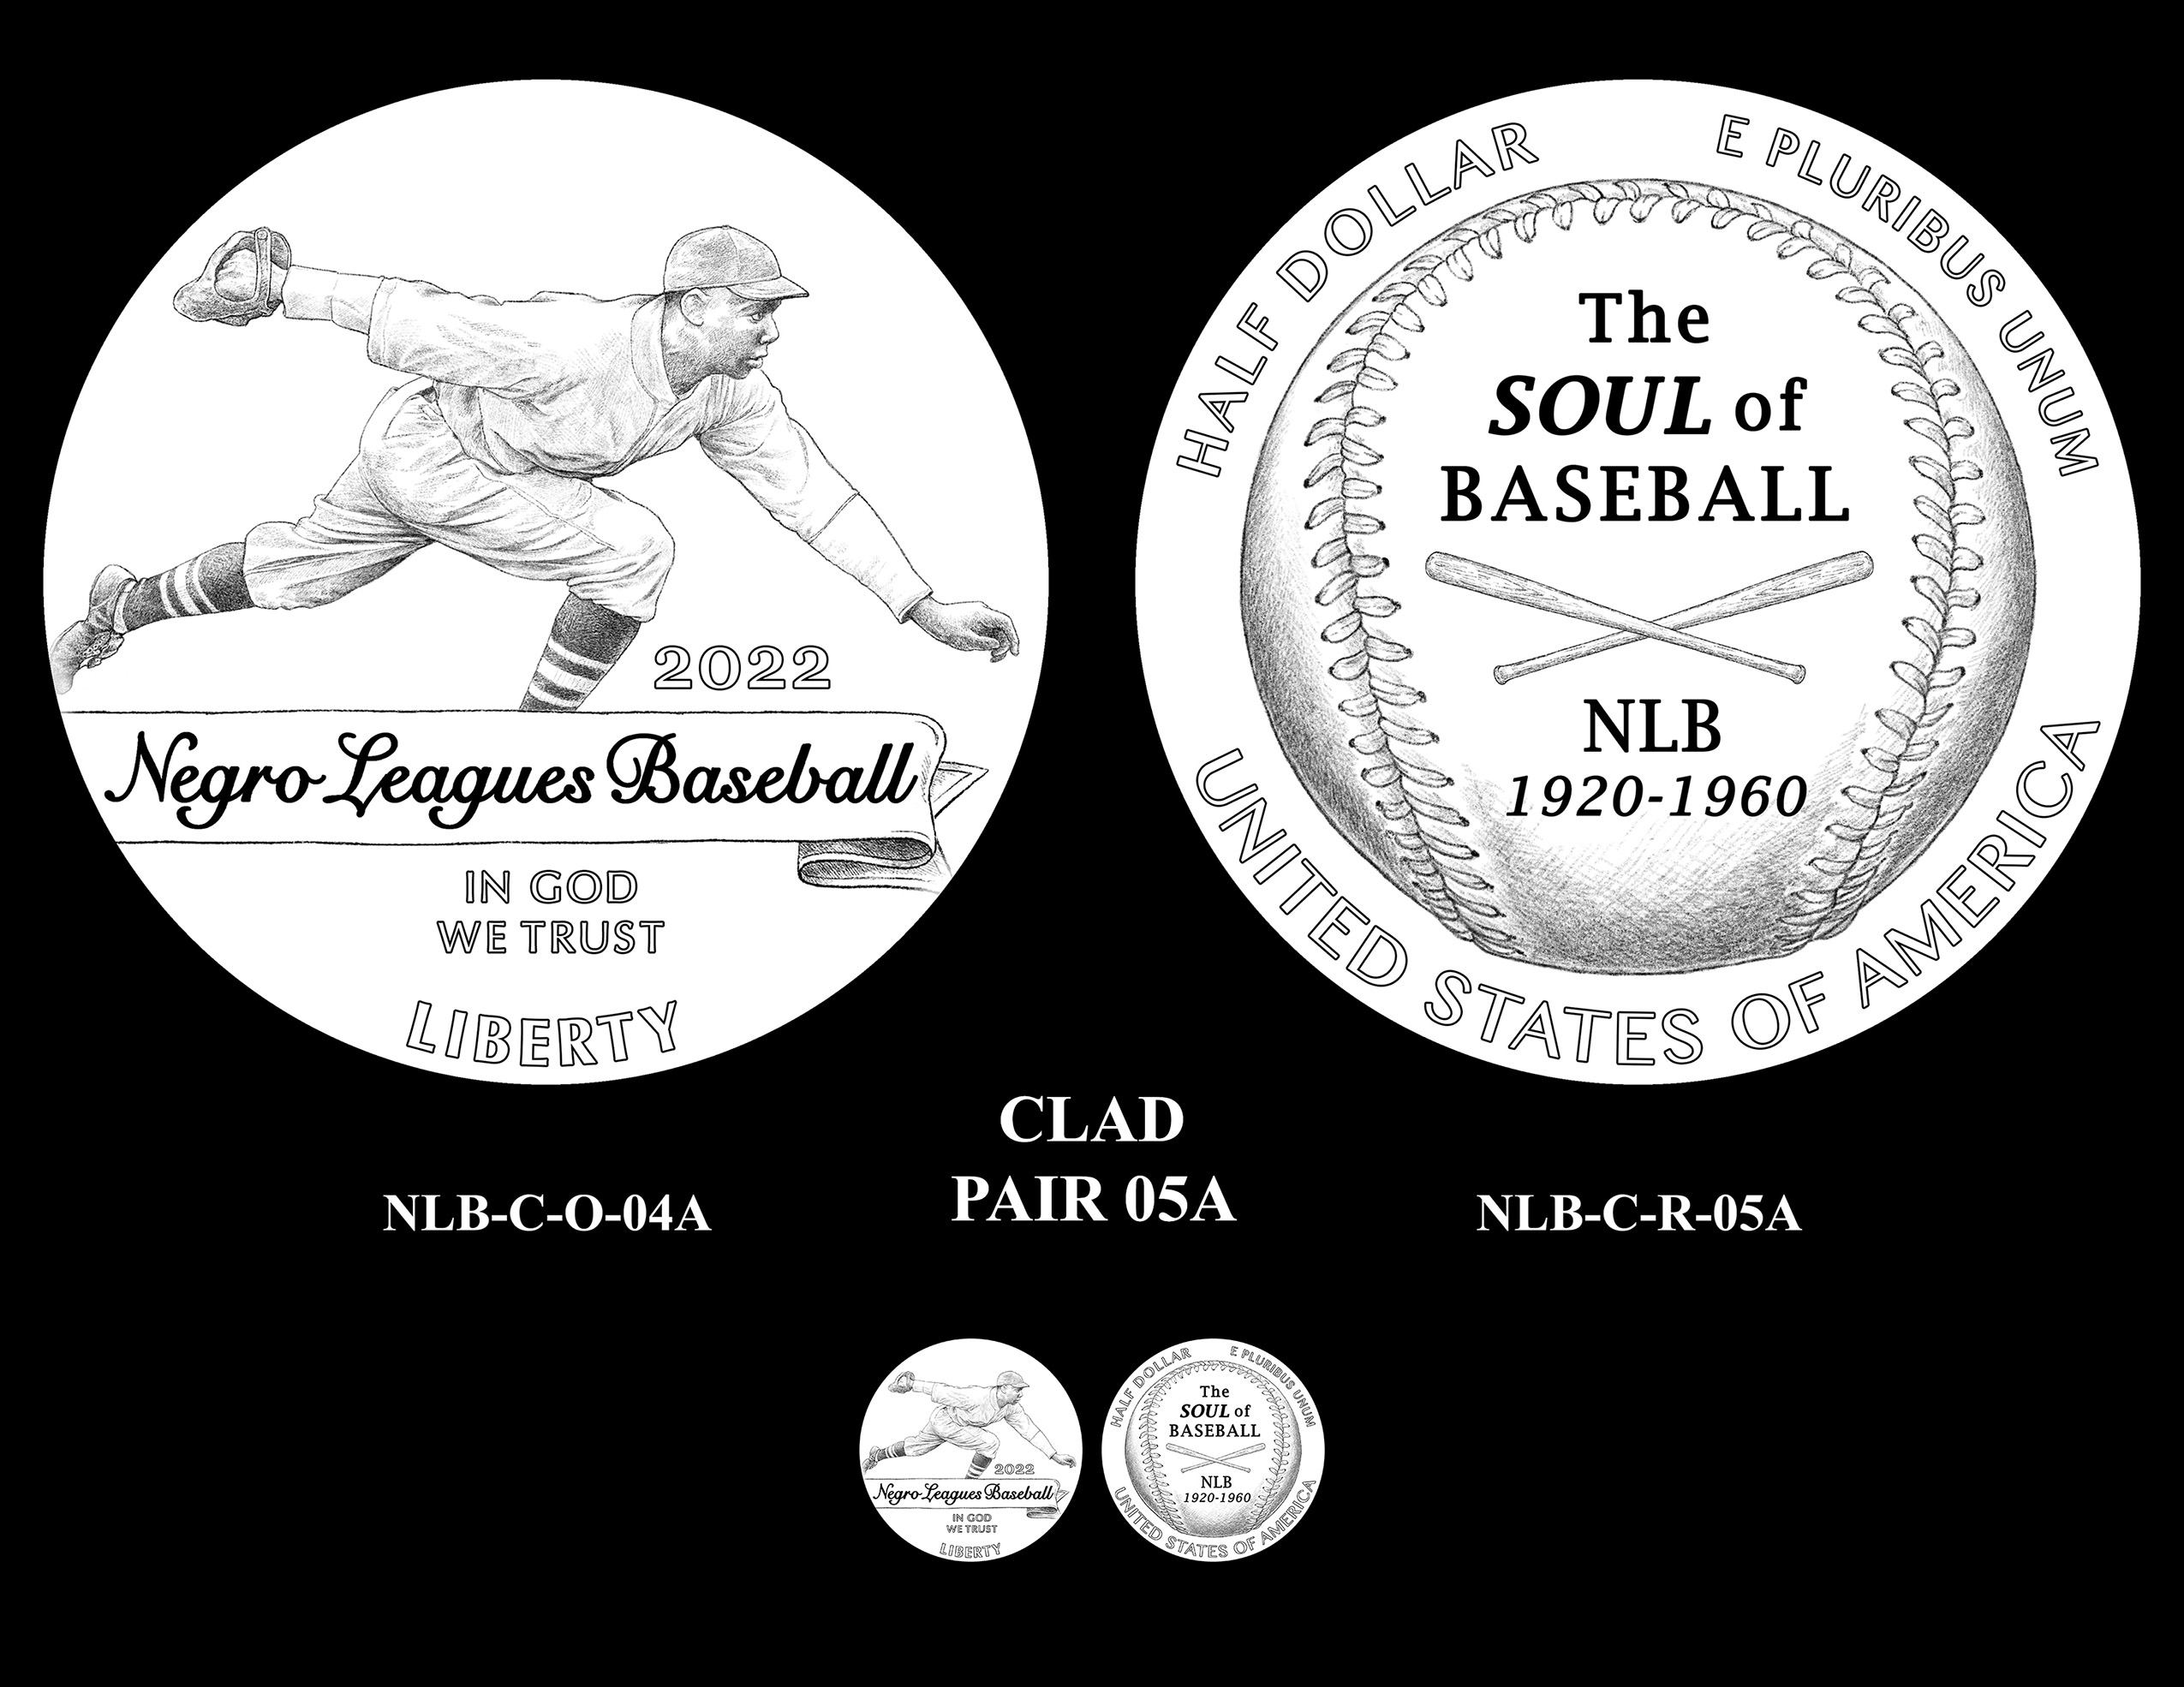 Clad Pair 05A -- Negro Leagues Baseball Commemorative Coin Program